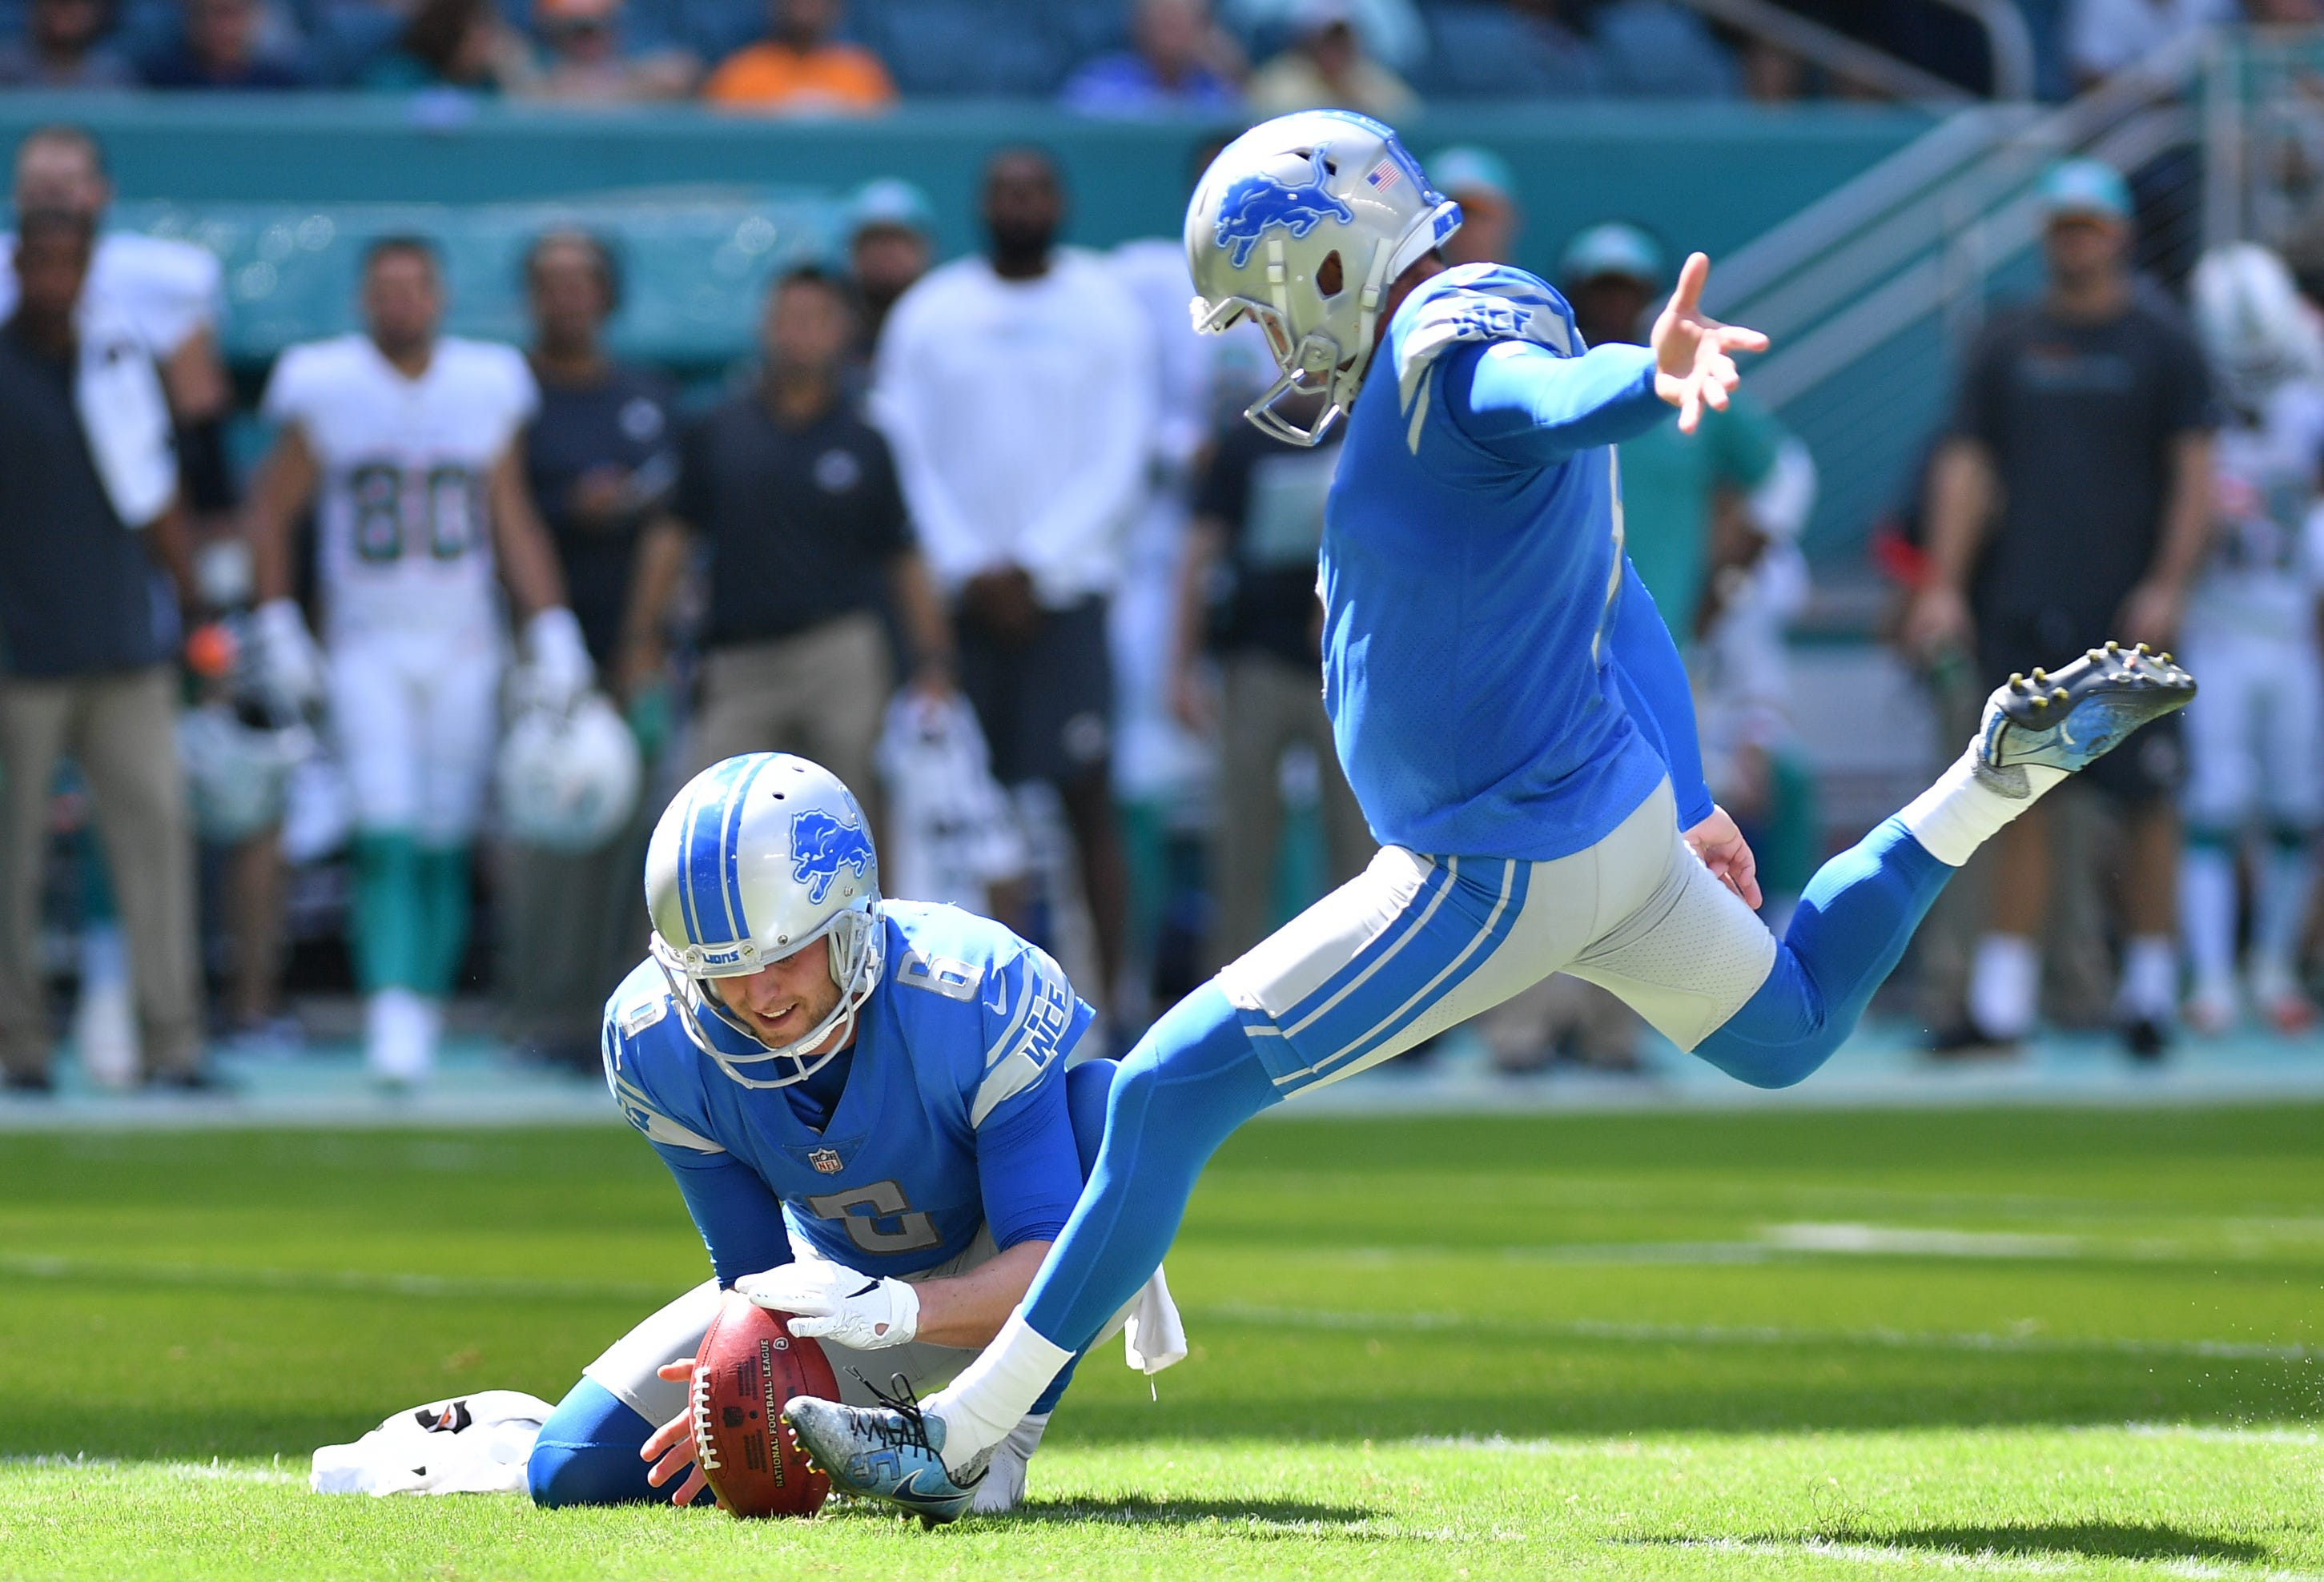 Lions kicker Matt Prater kicks a field goal in the second quarter of the Lions' 32-21 win on Sunday, Oct. 21, 2018, in Miami Gardens, Fla.